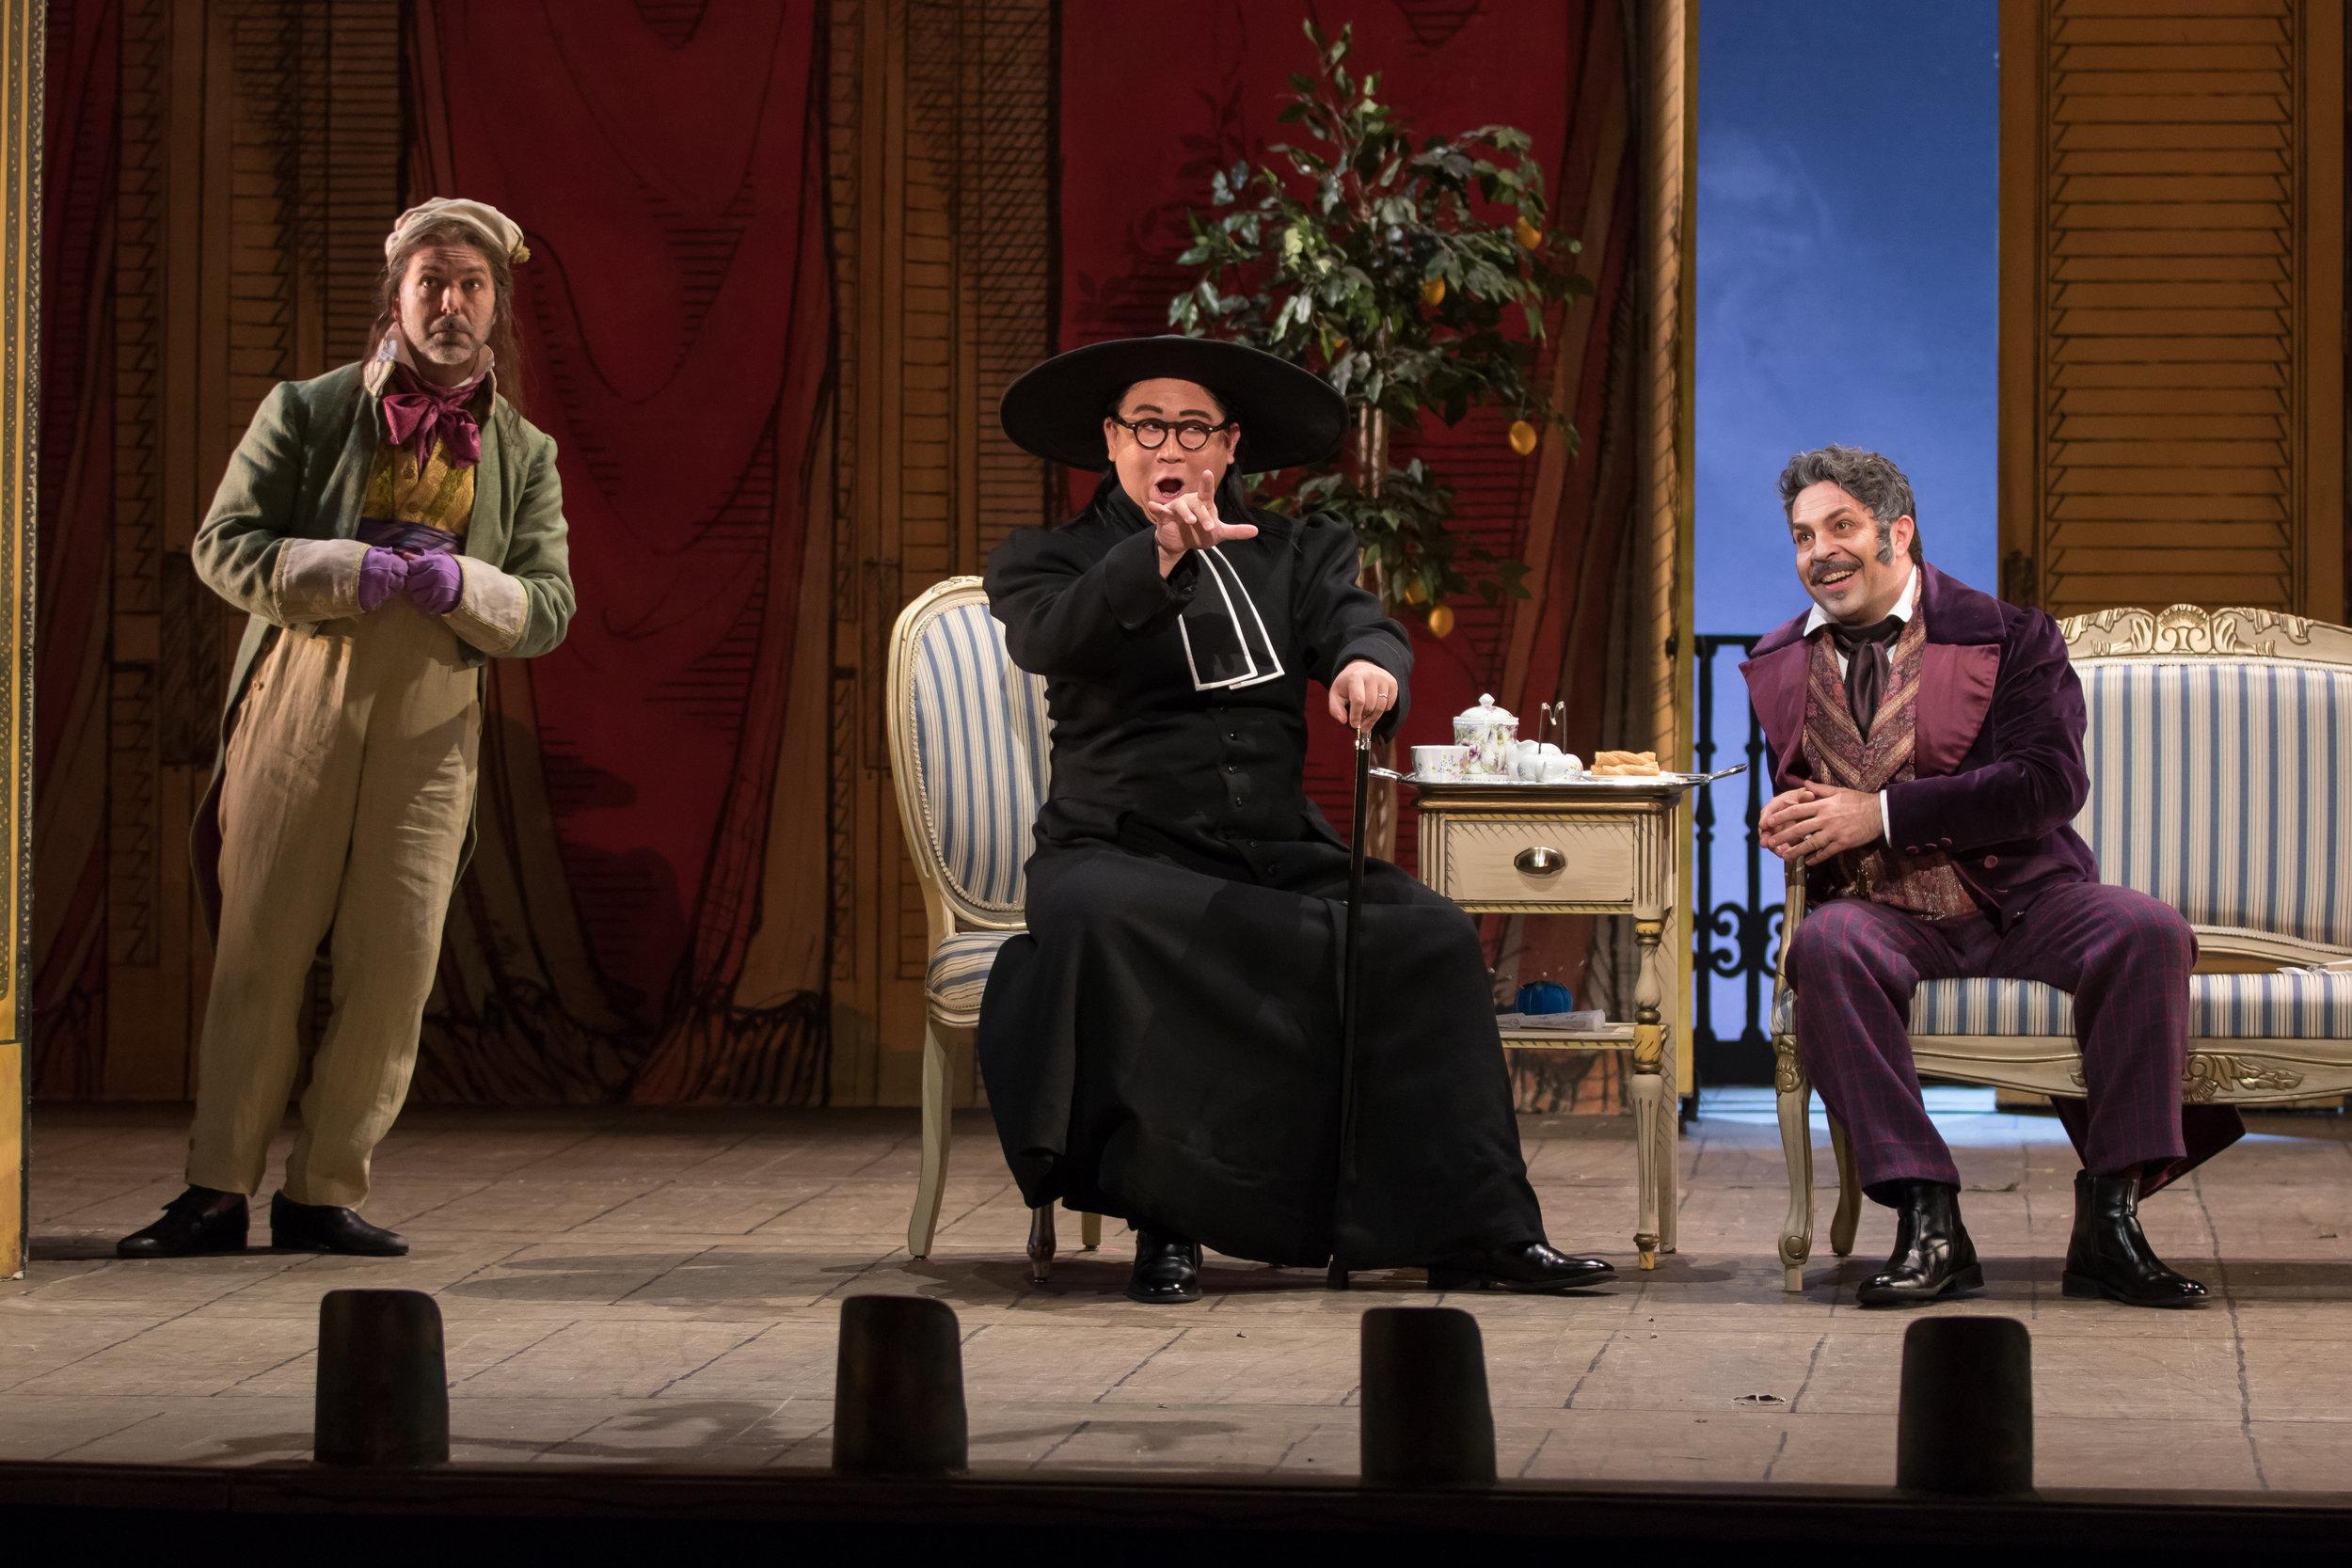 Ambrogio (Matthew Pauli), Don Basilio (Wei Wu), and Paolo Bordogna (Dr. Bartolo). Photo by Scott Suchman; courtesy of Washington National Opera.